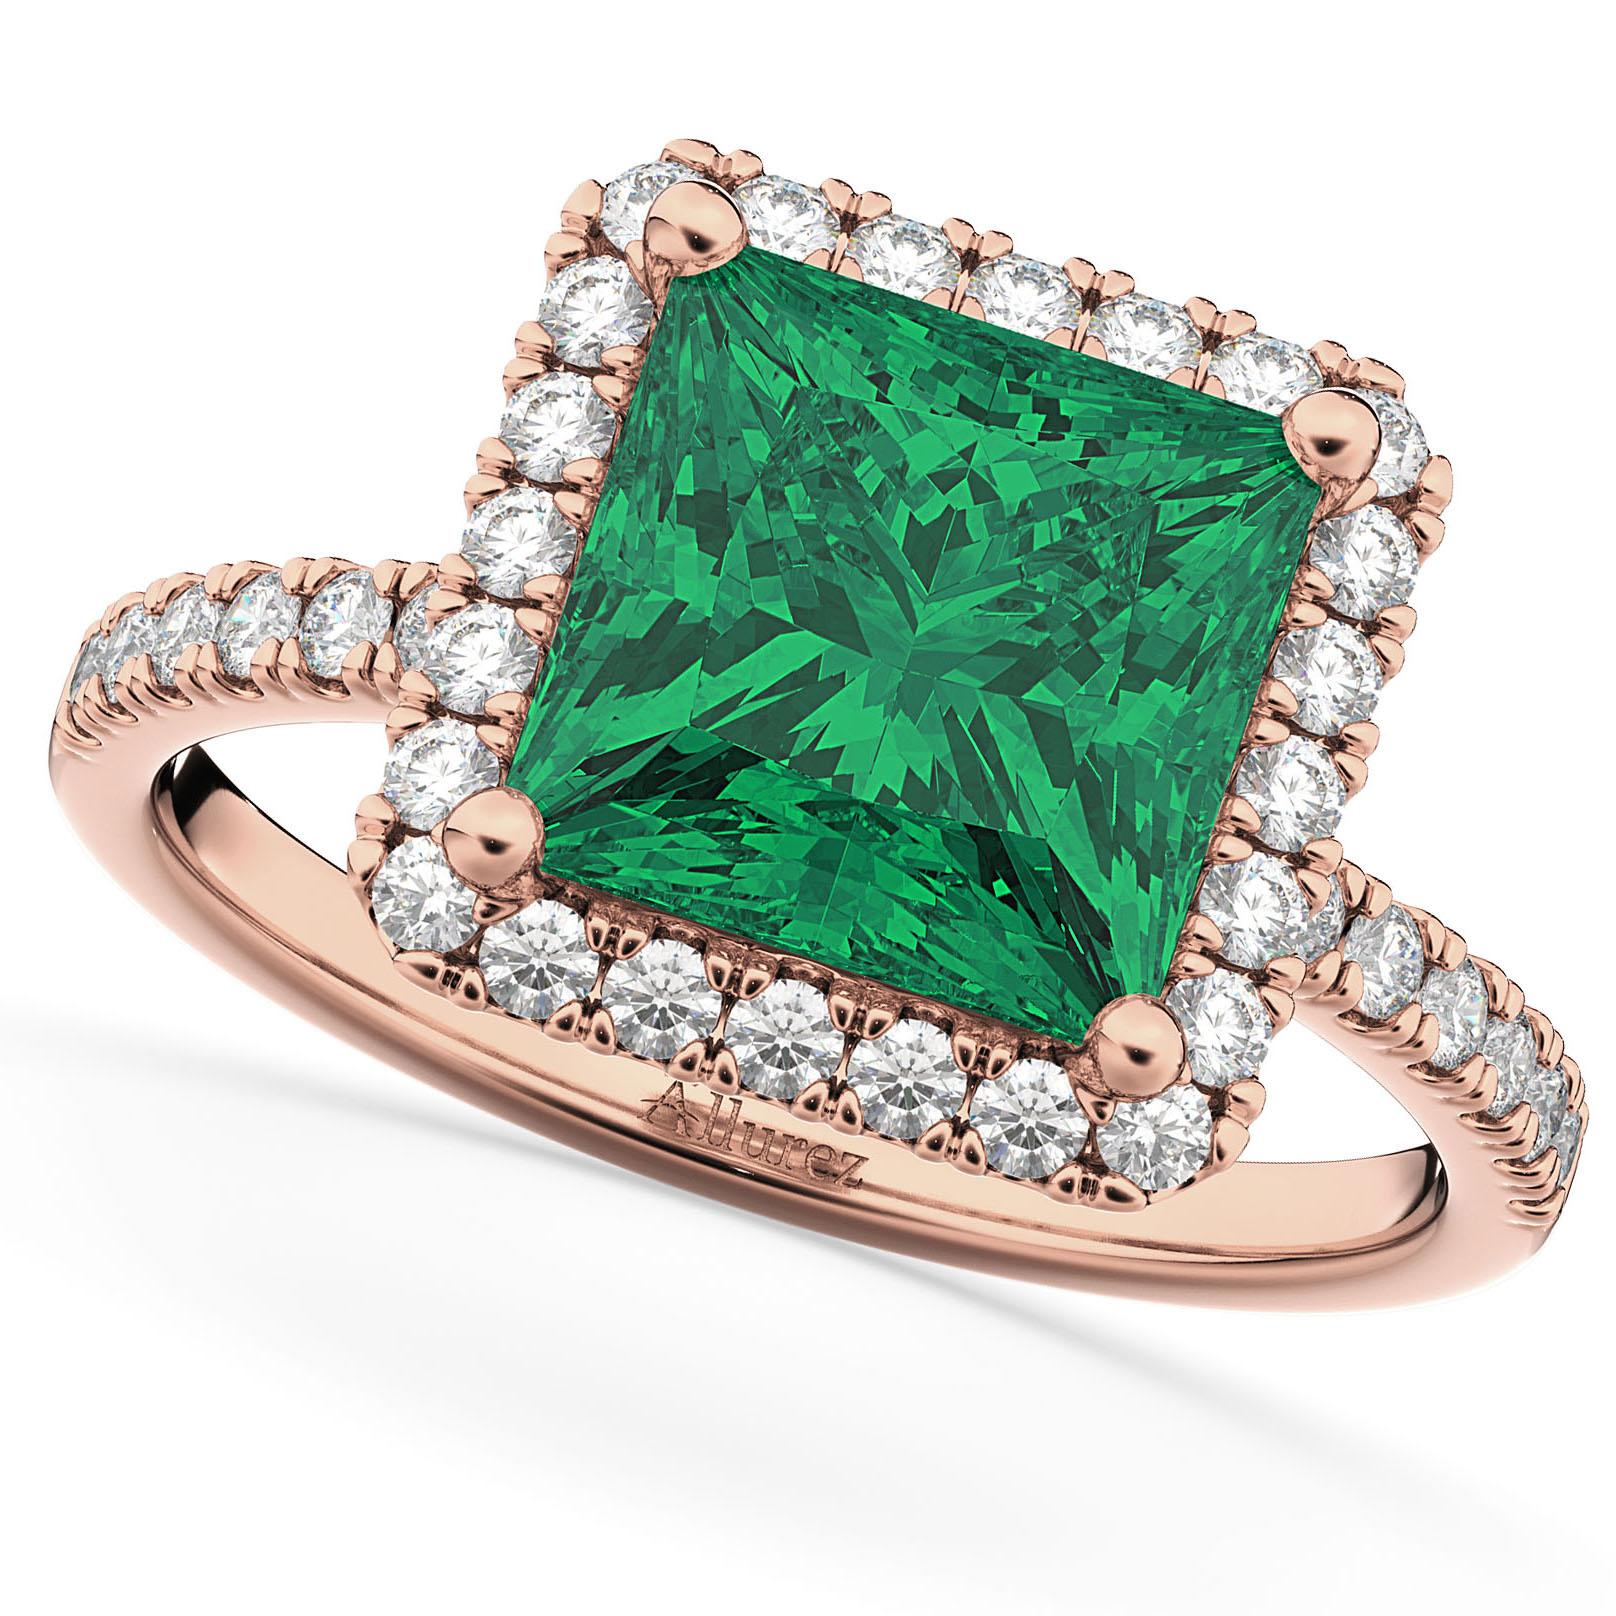 Princess Cut Halo Emerald & Diamond Engagement Ring 14K Rose Gold 3.57ct